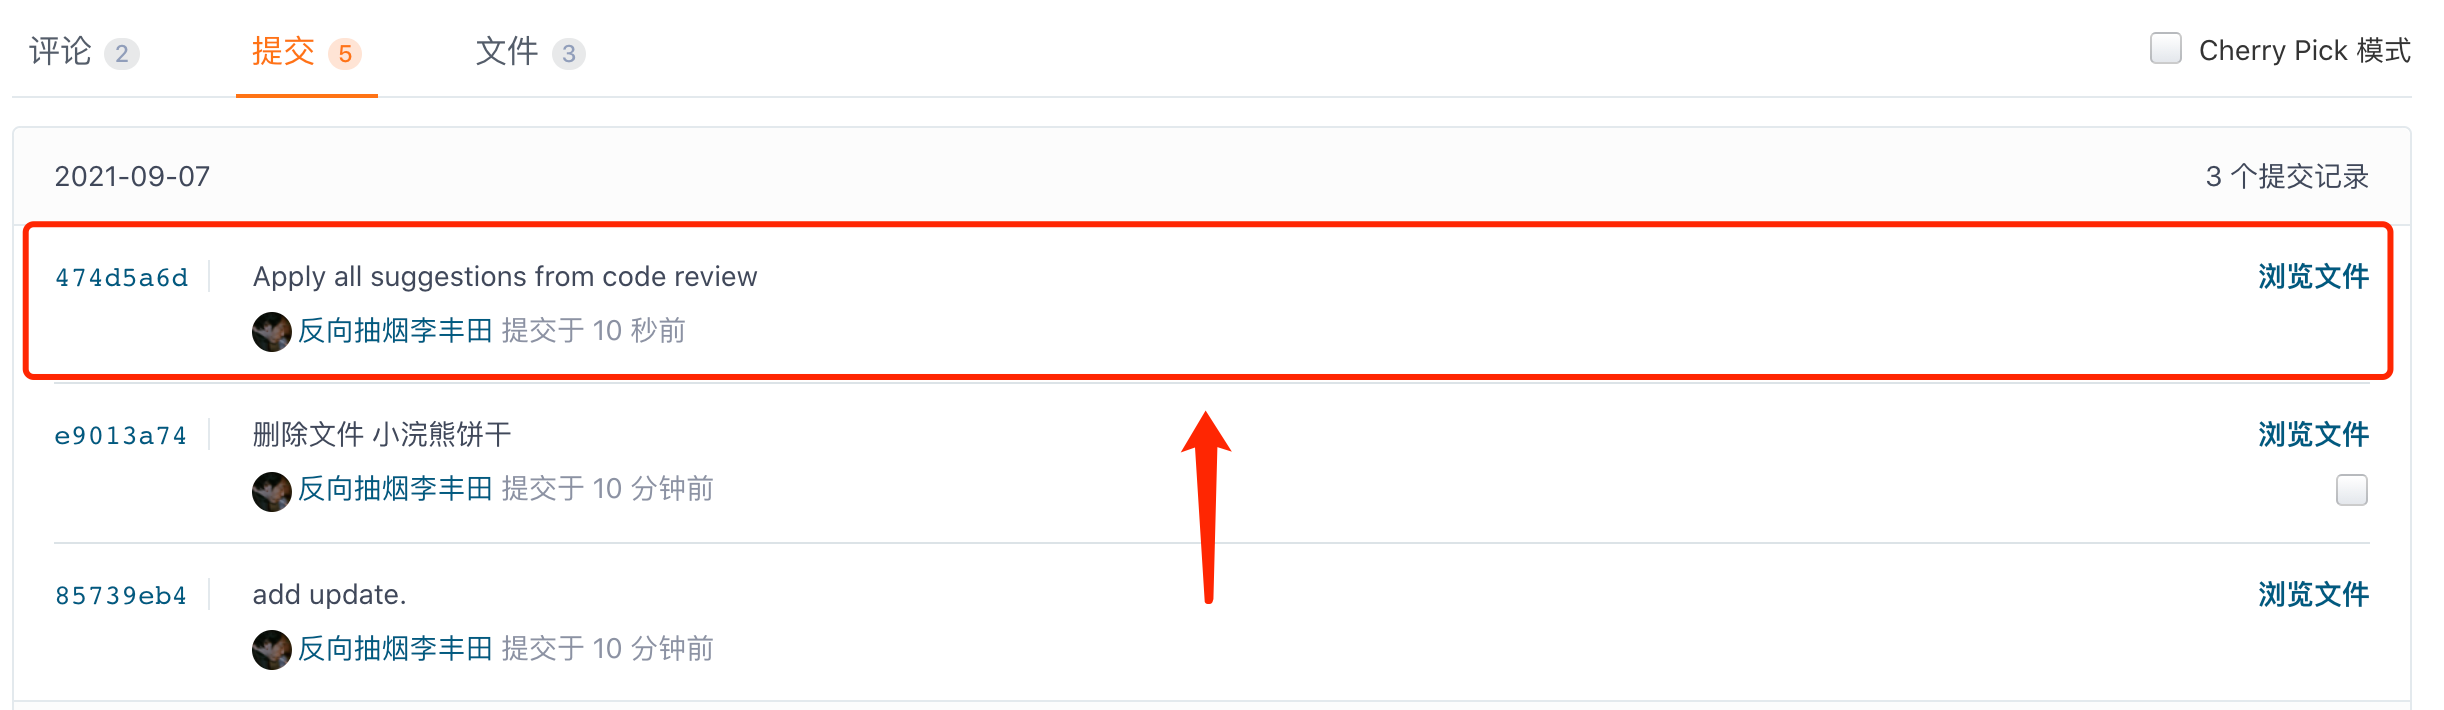 Pull Request 大进化!在Gitee审代码,体验就是如此舒畅-Gitee 官方博客